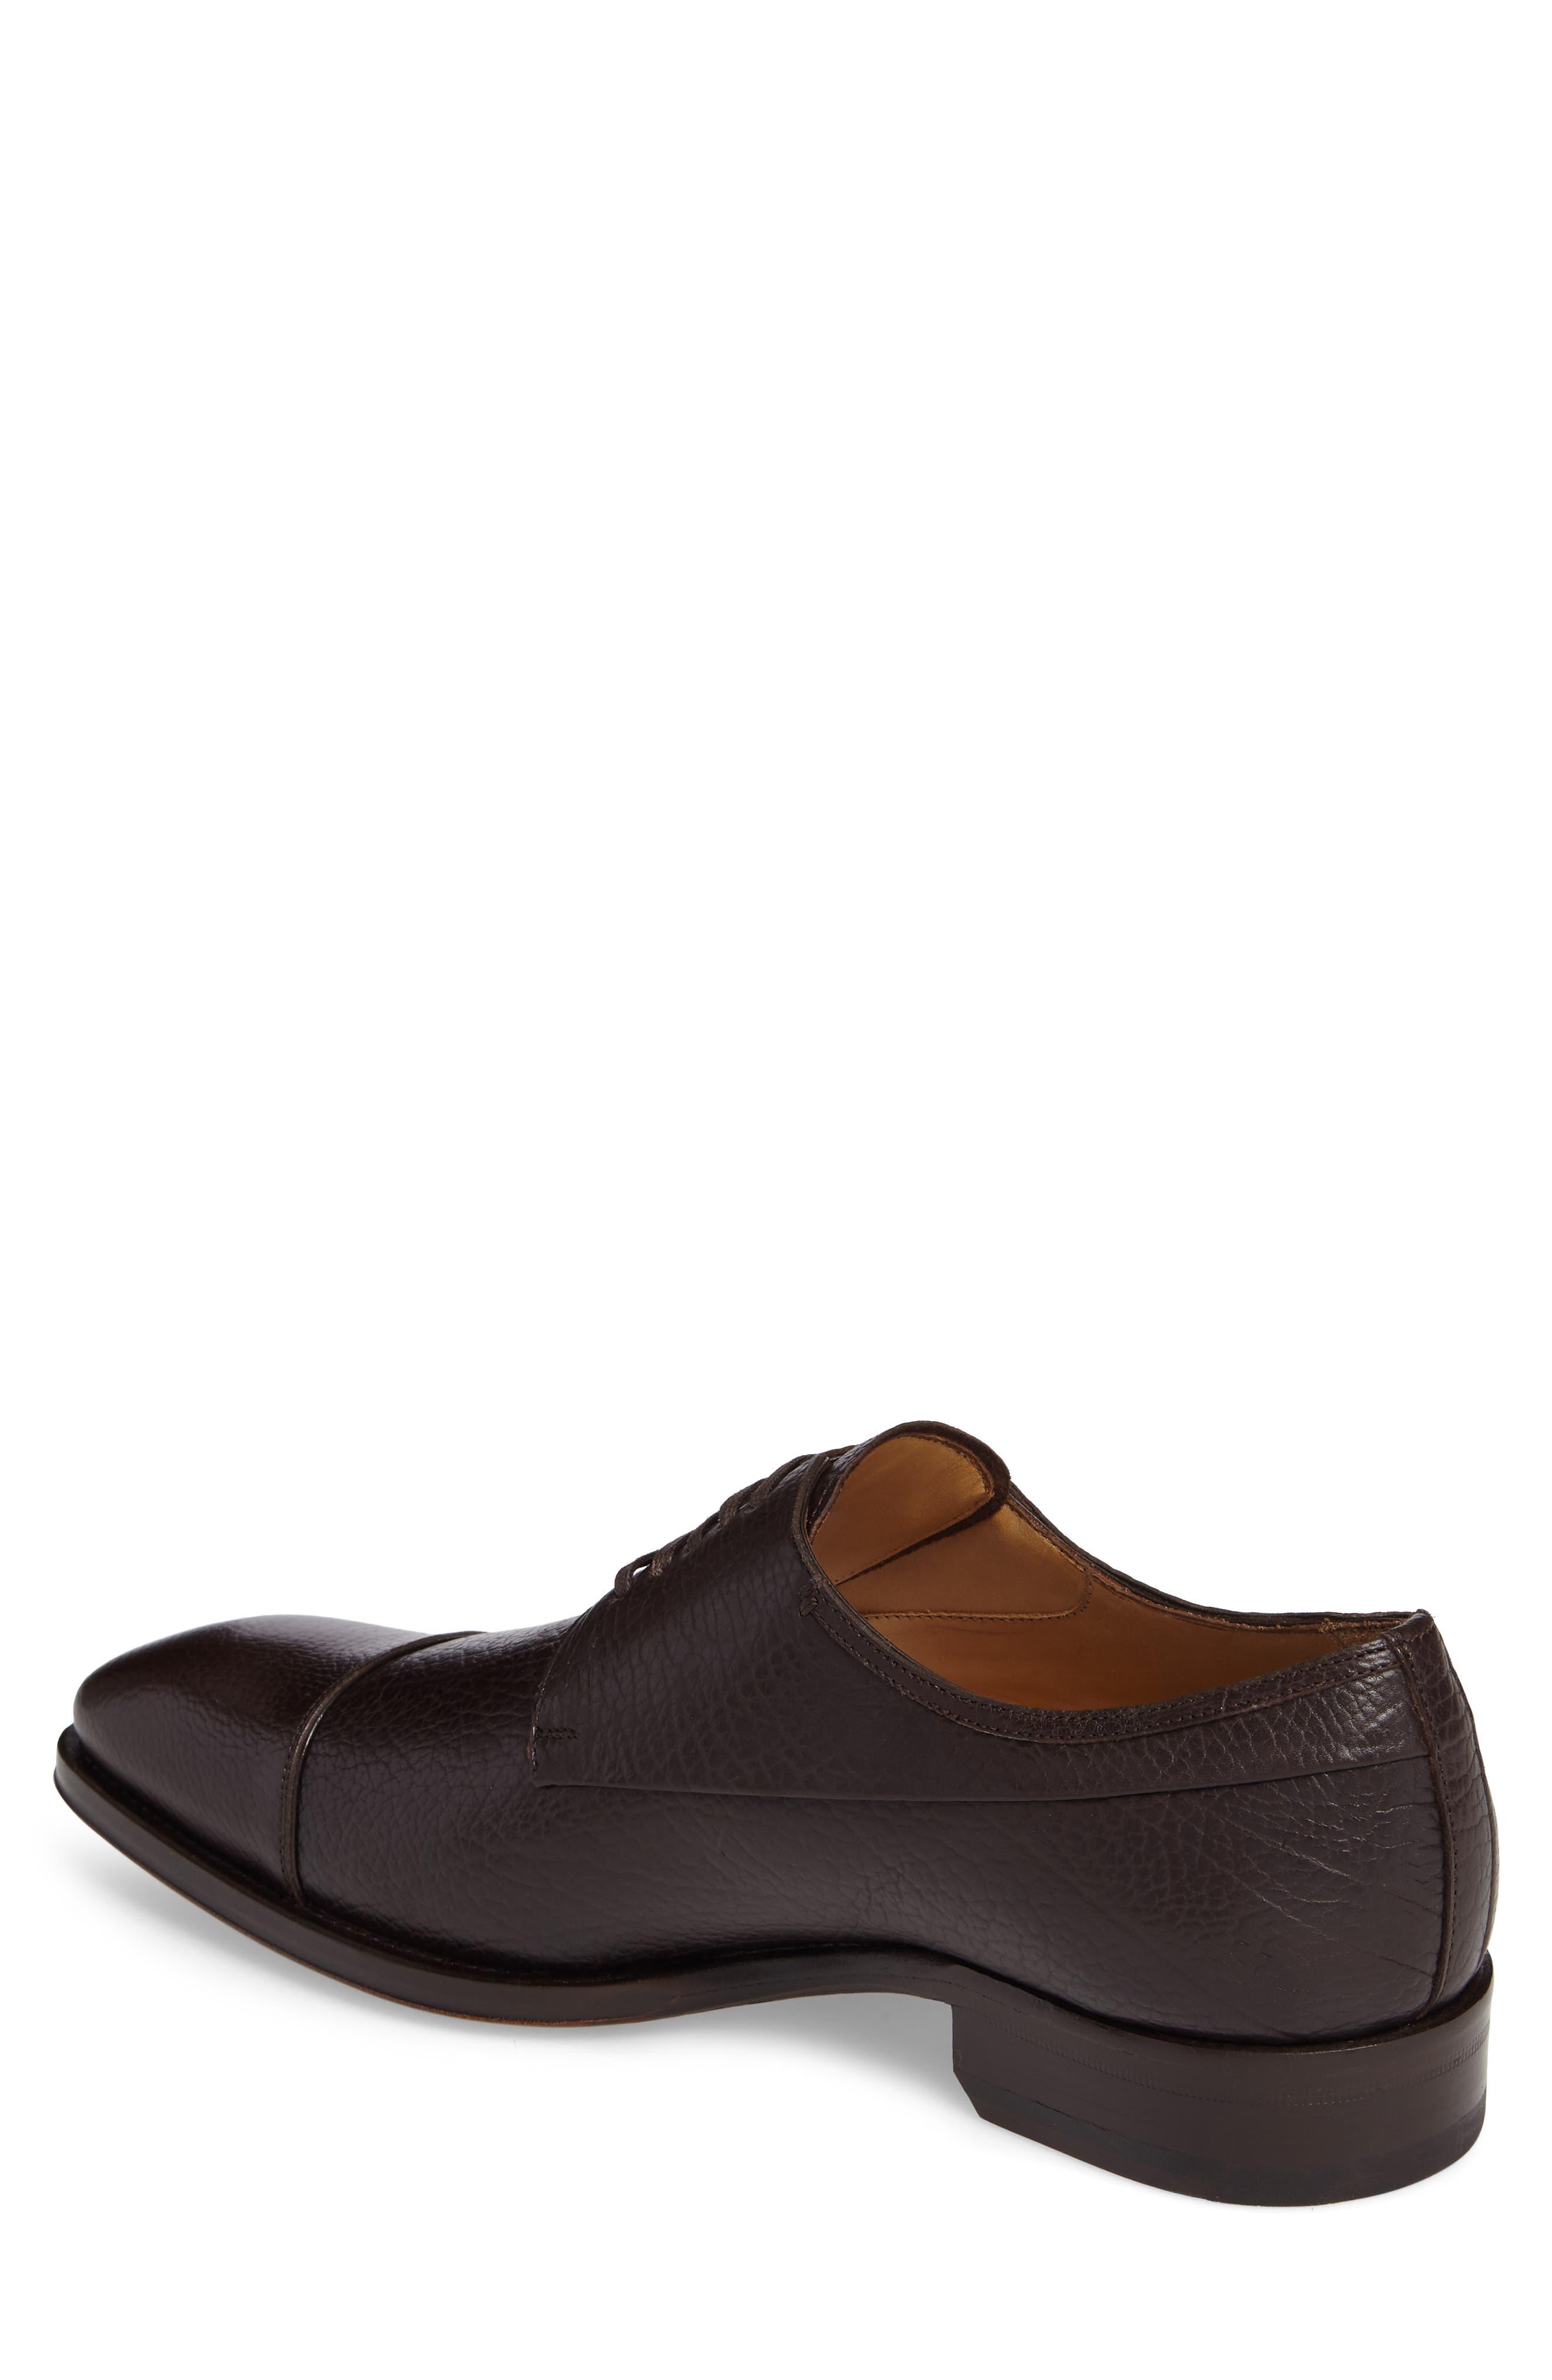 Pulpi Cap Toe Derby,                             Alternate thumbnail 2, color,                             Brown Leather